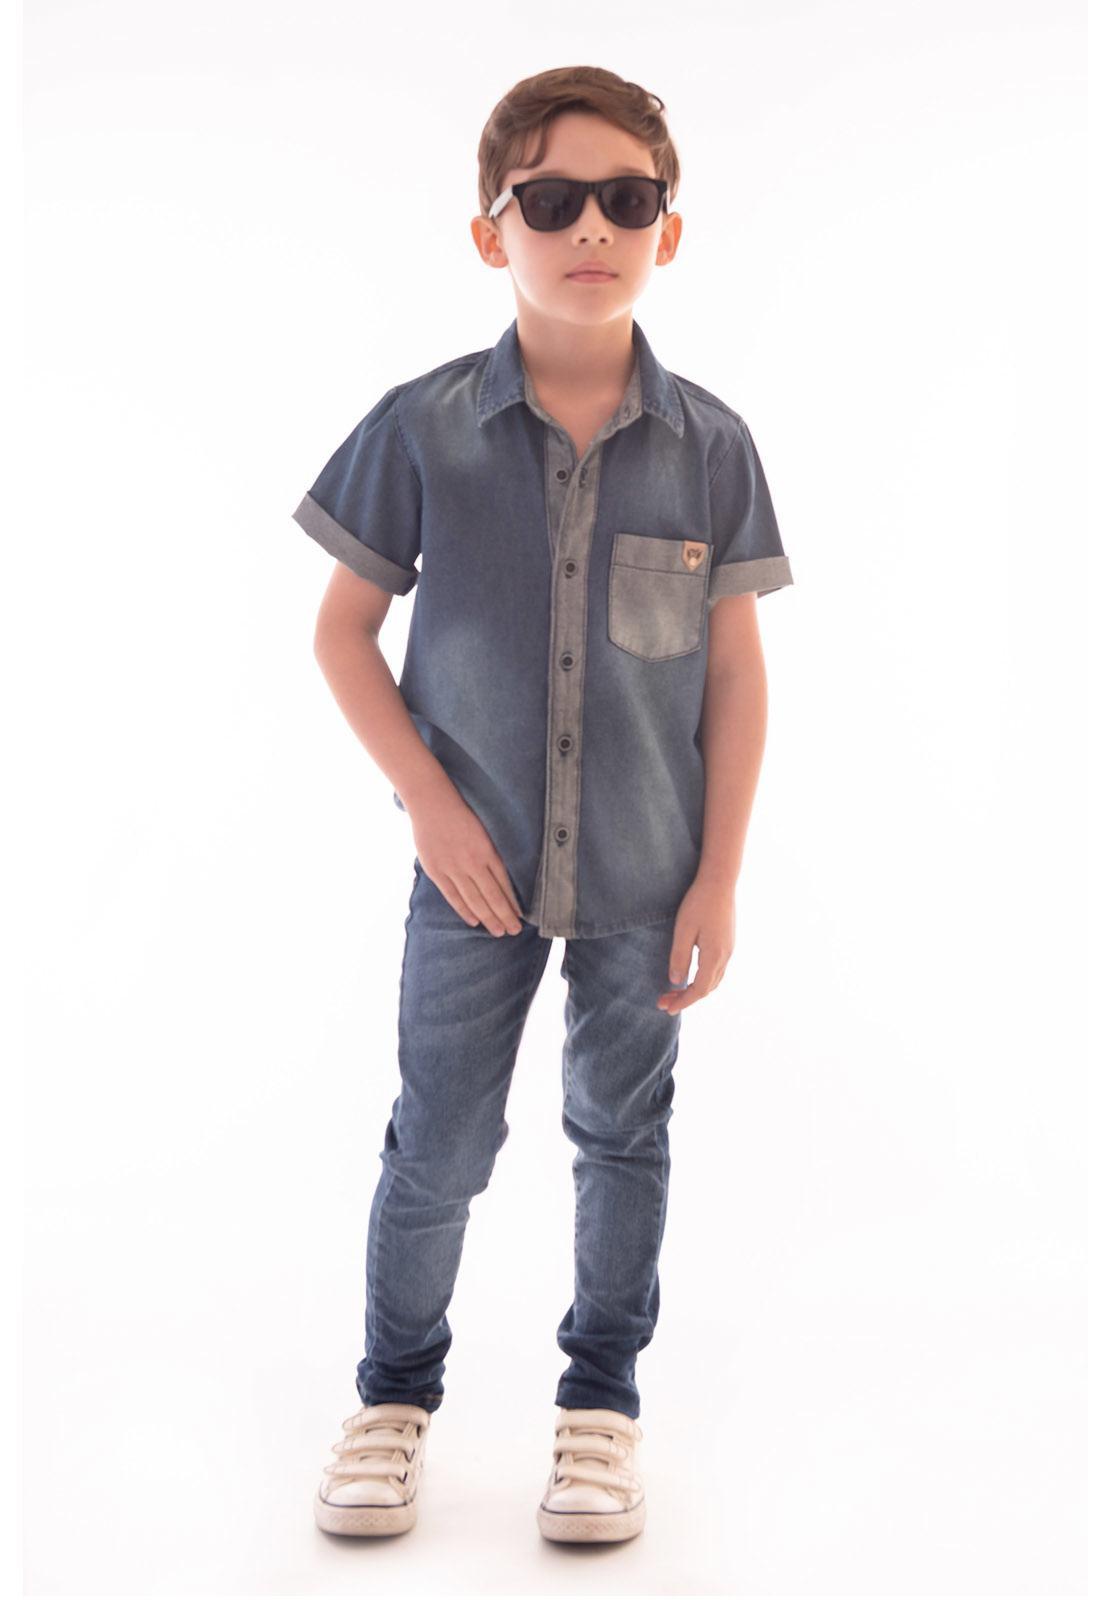 Camisa Jeans Manga Curta Detalhes Inverso Ref. 520